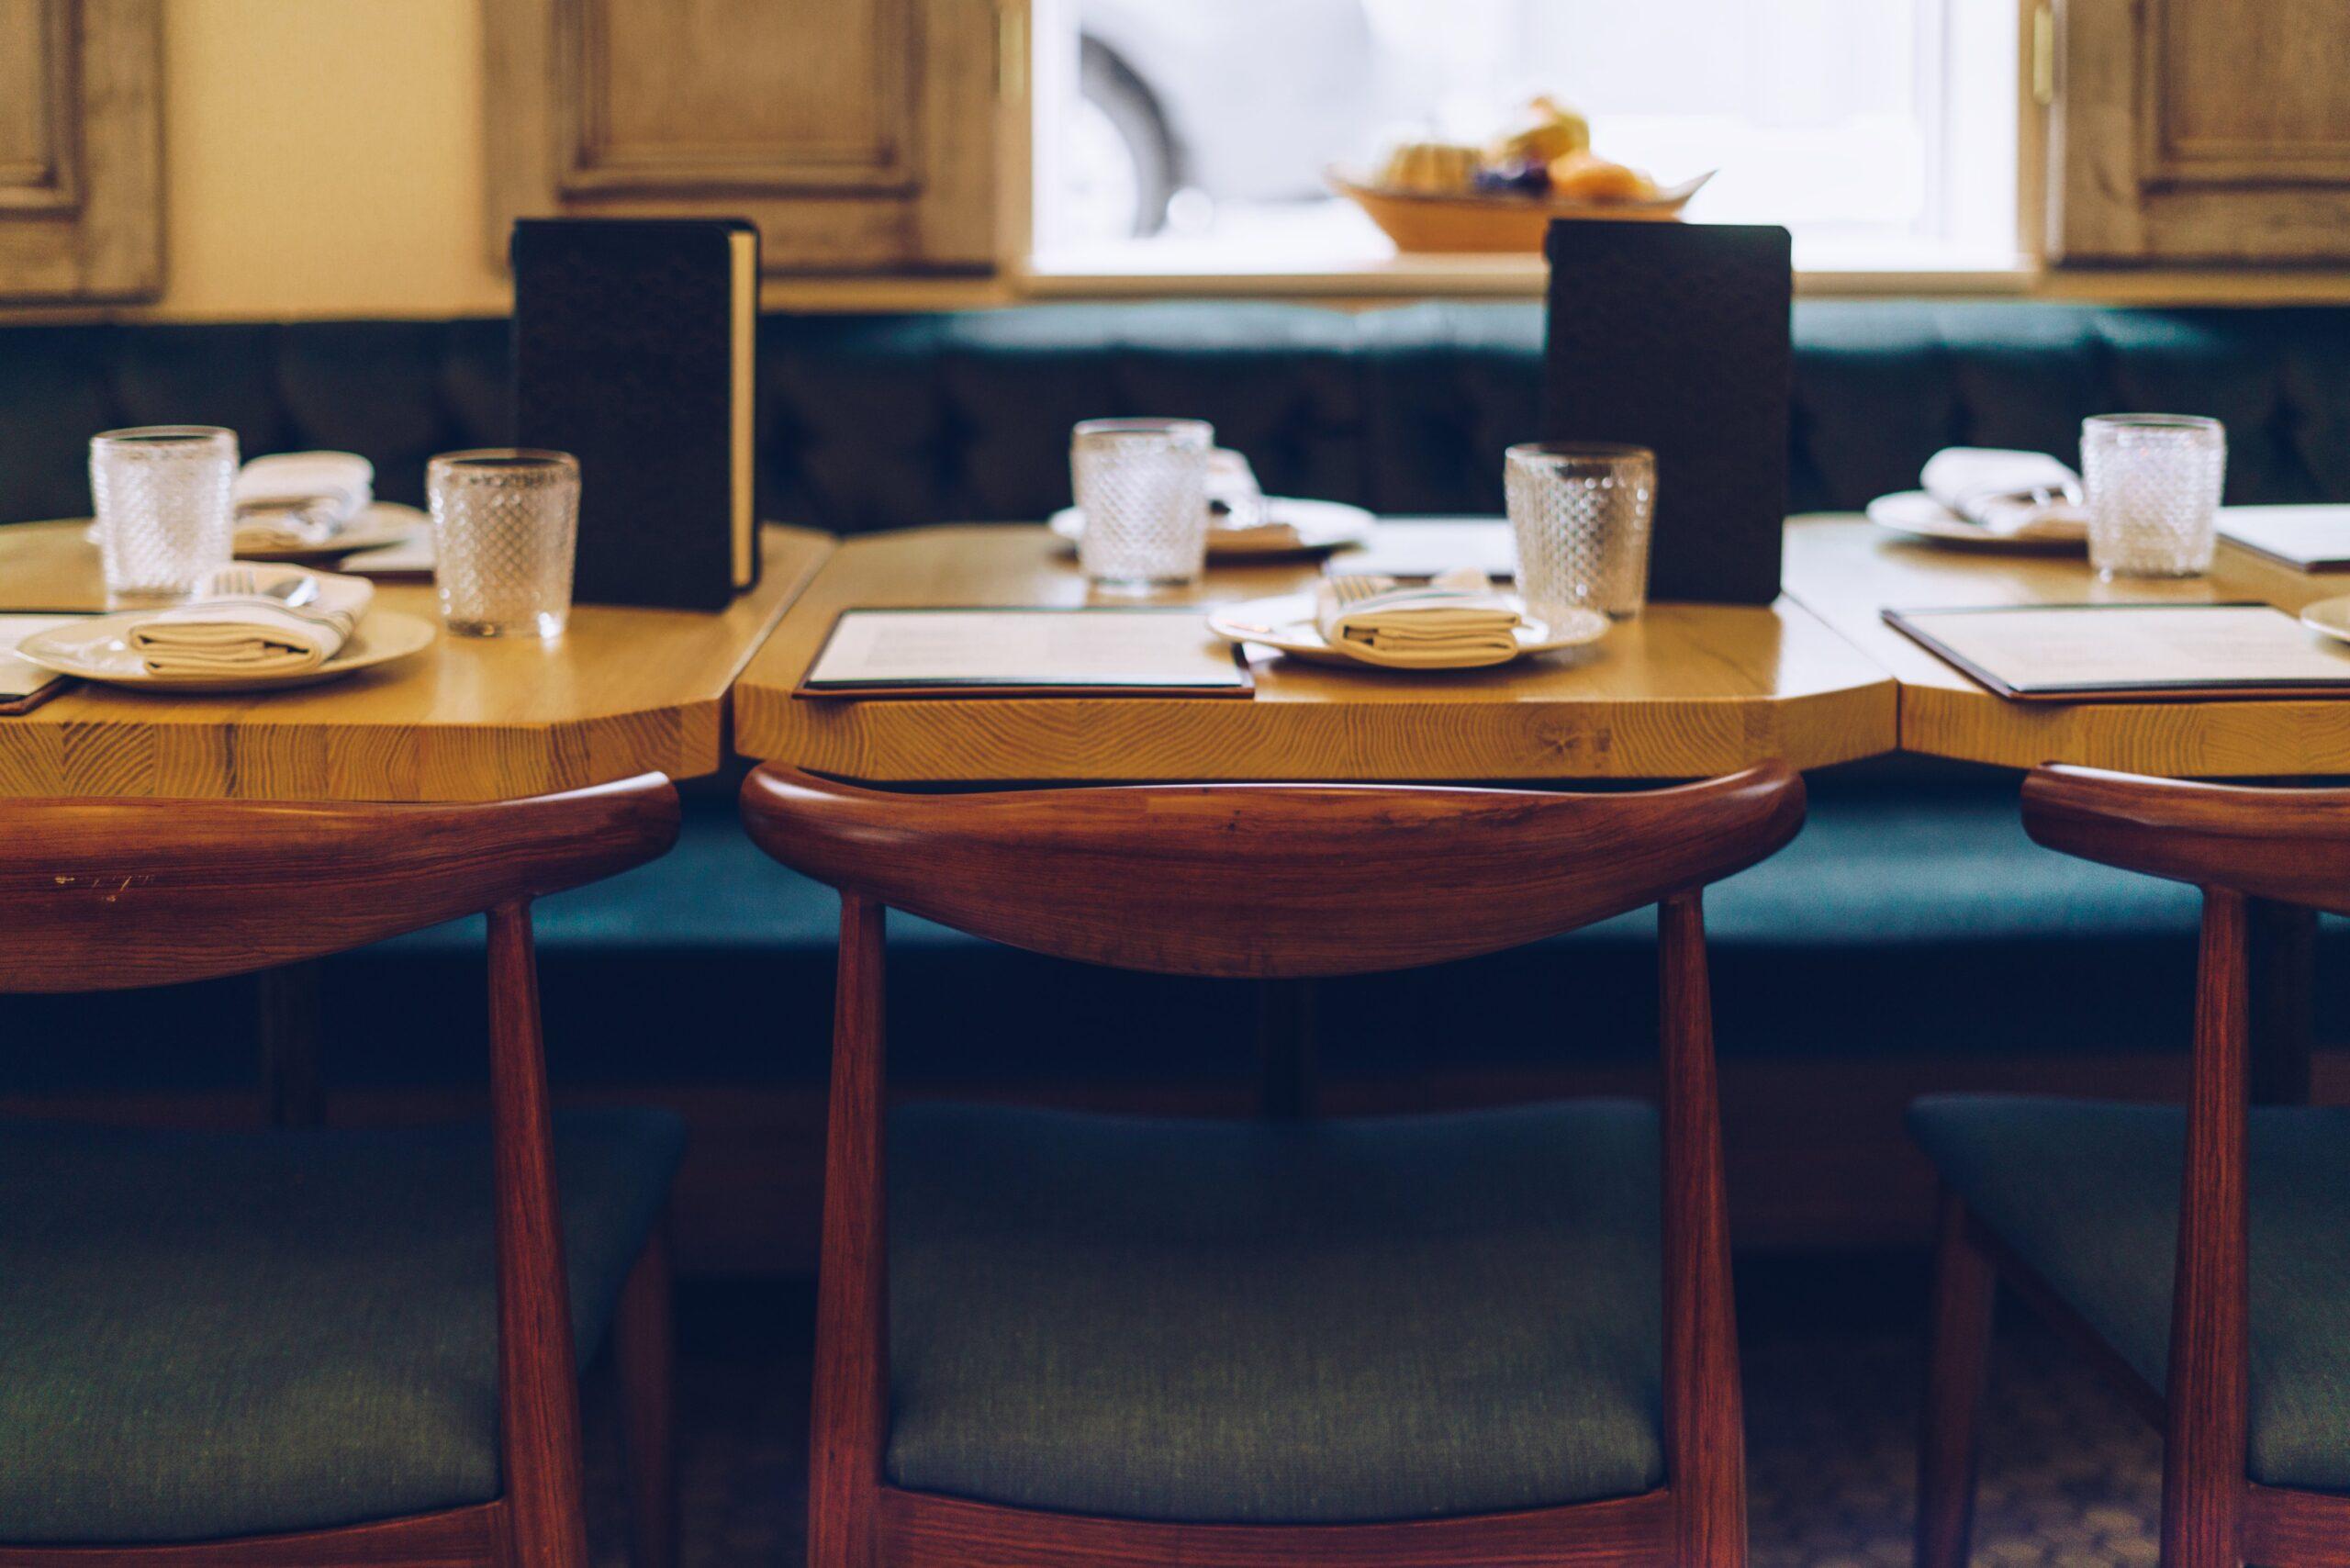 wood-set-table-at-restaurant.jpg